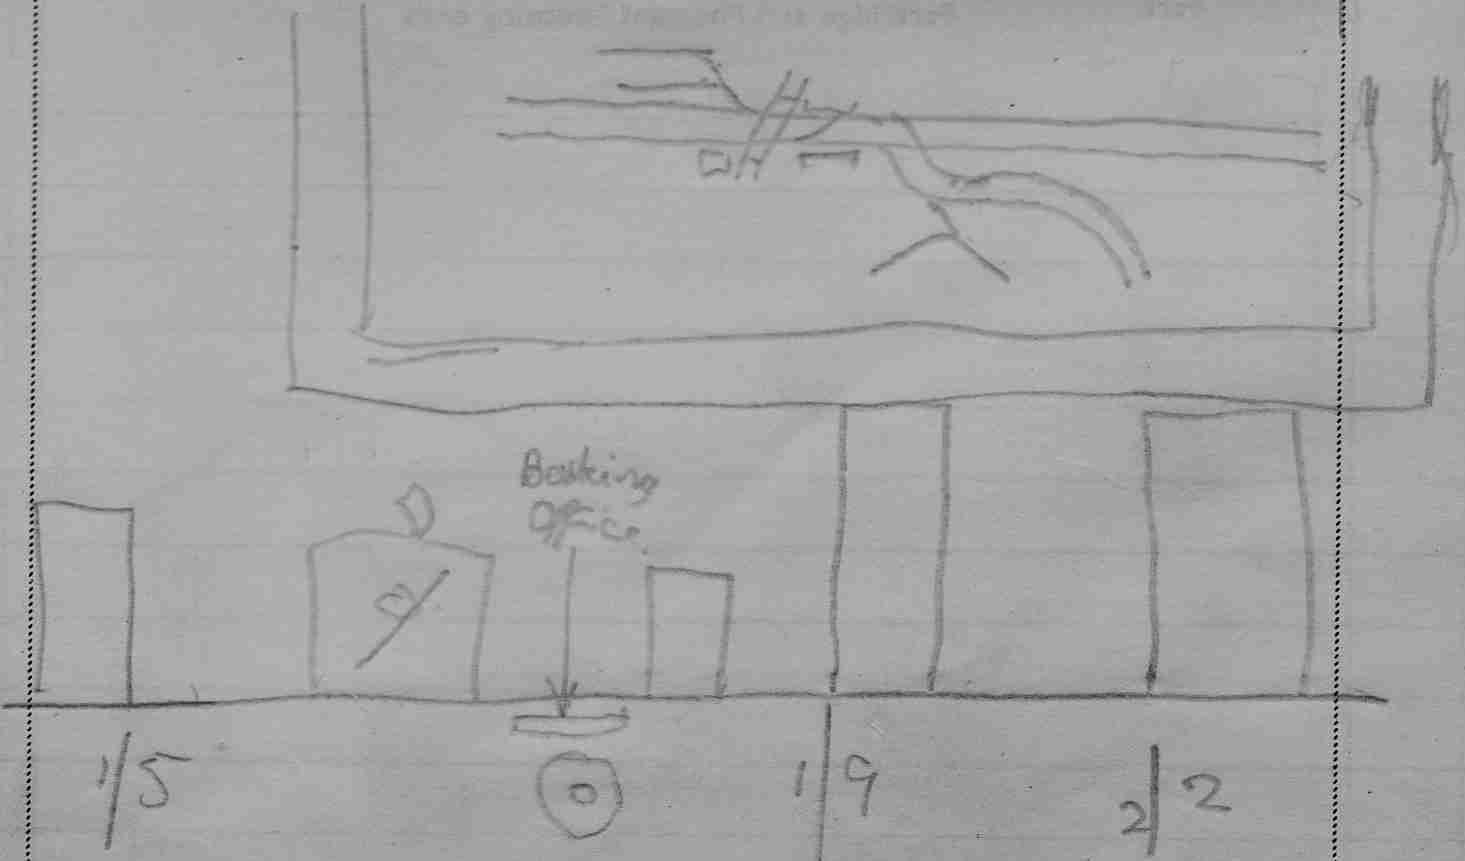 Jan Ford S World Railway Signalling Tipton Part 2